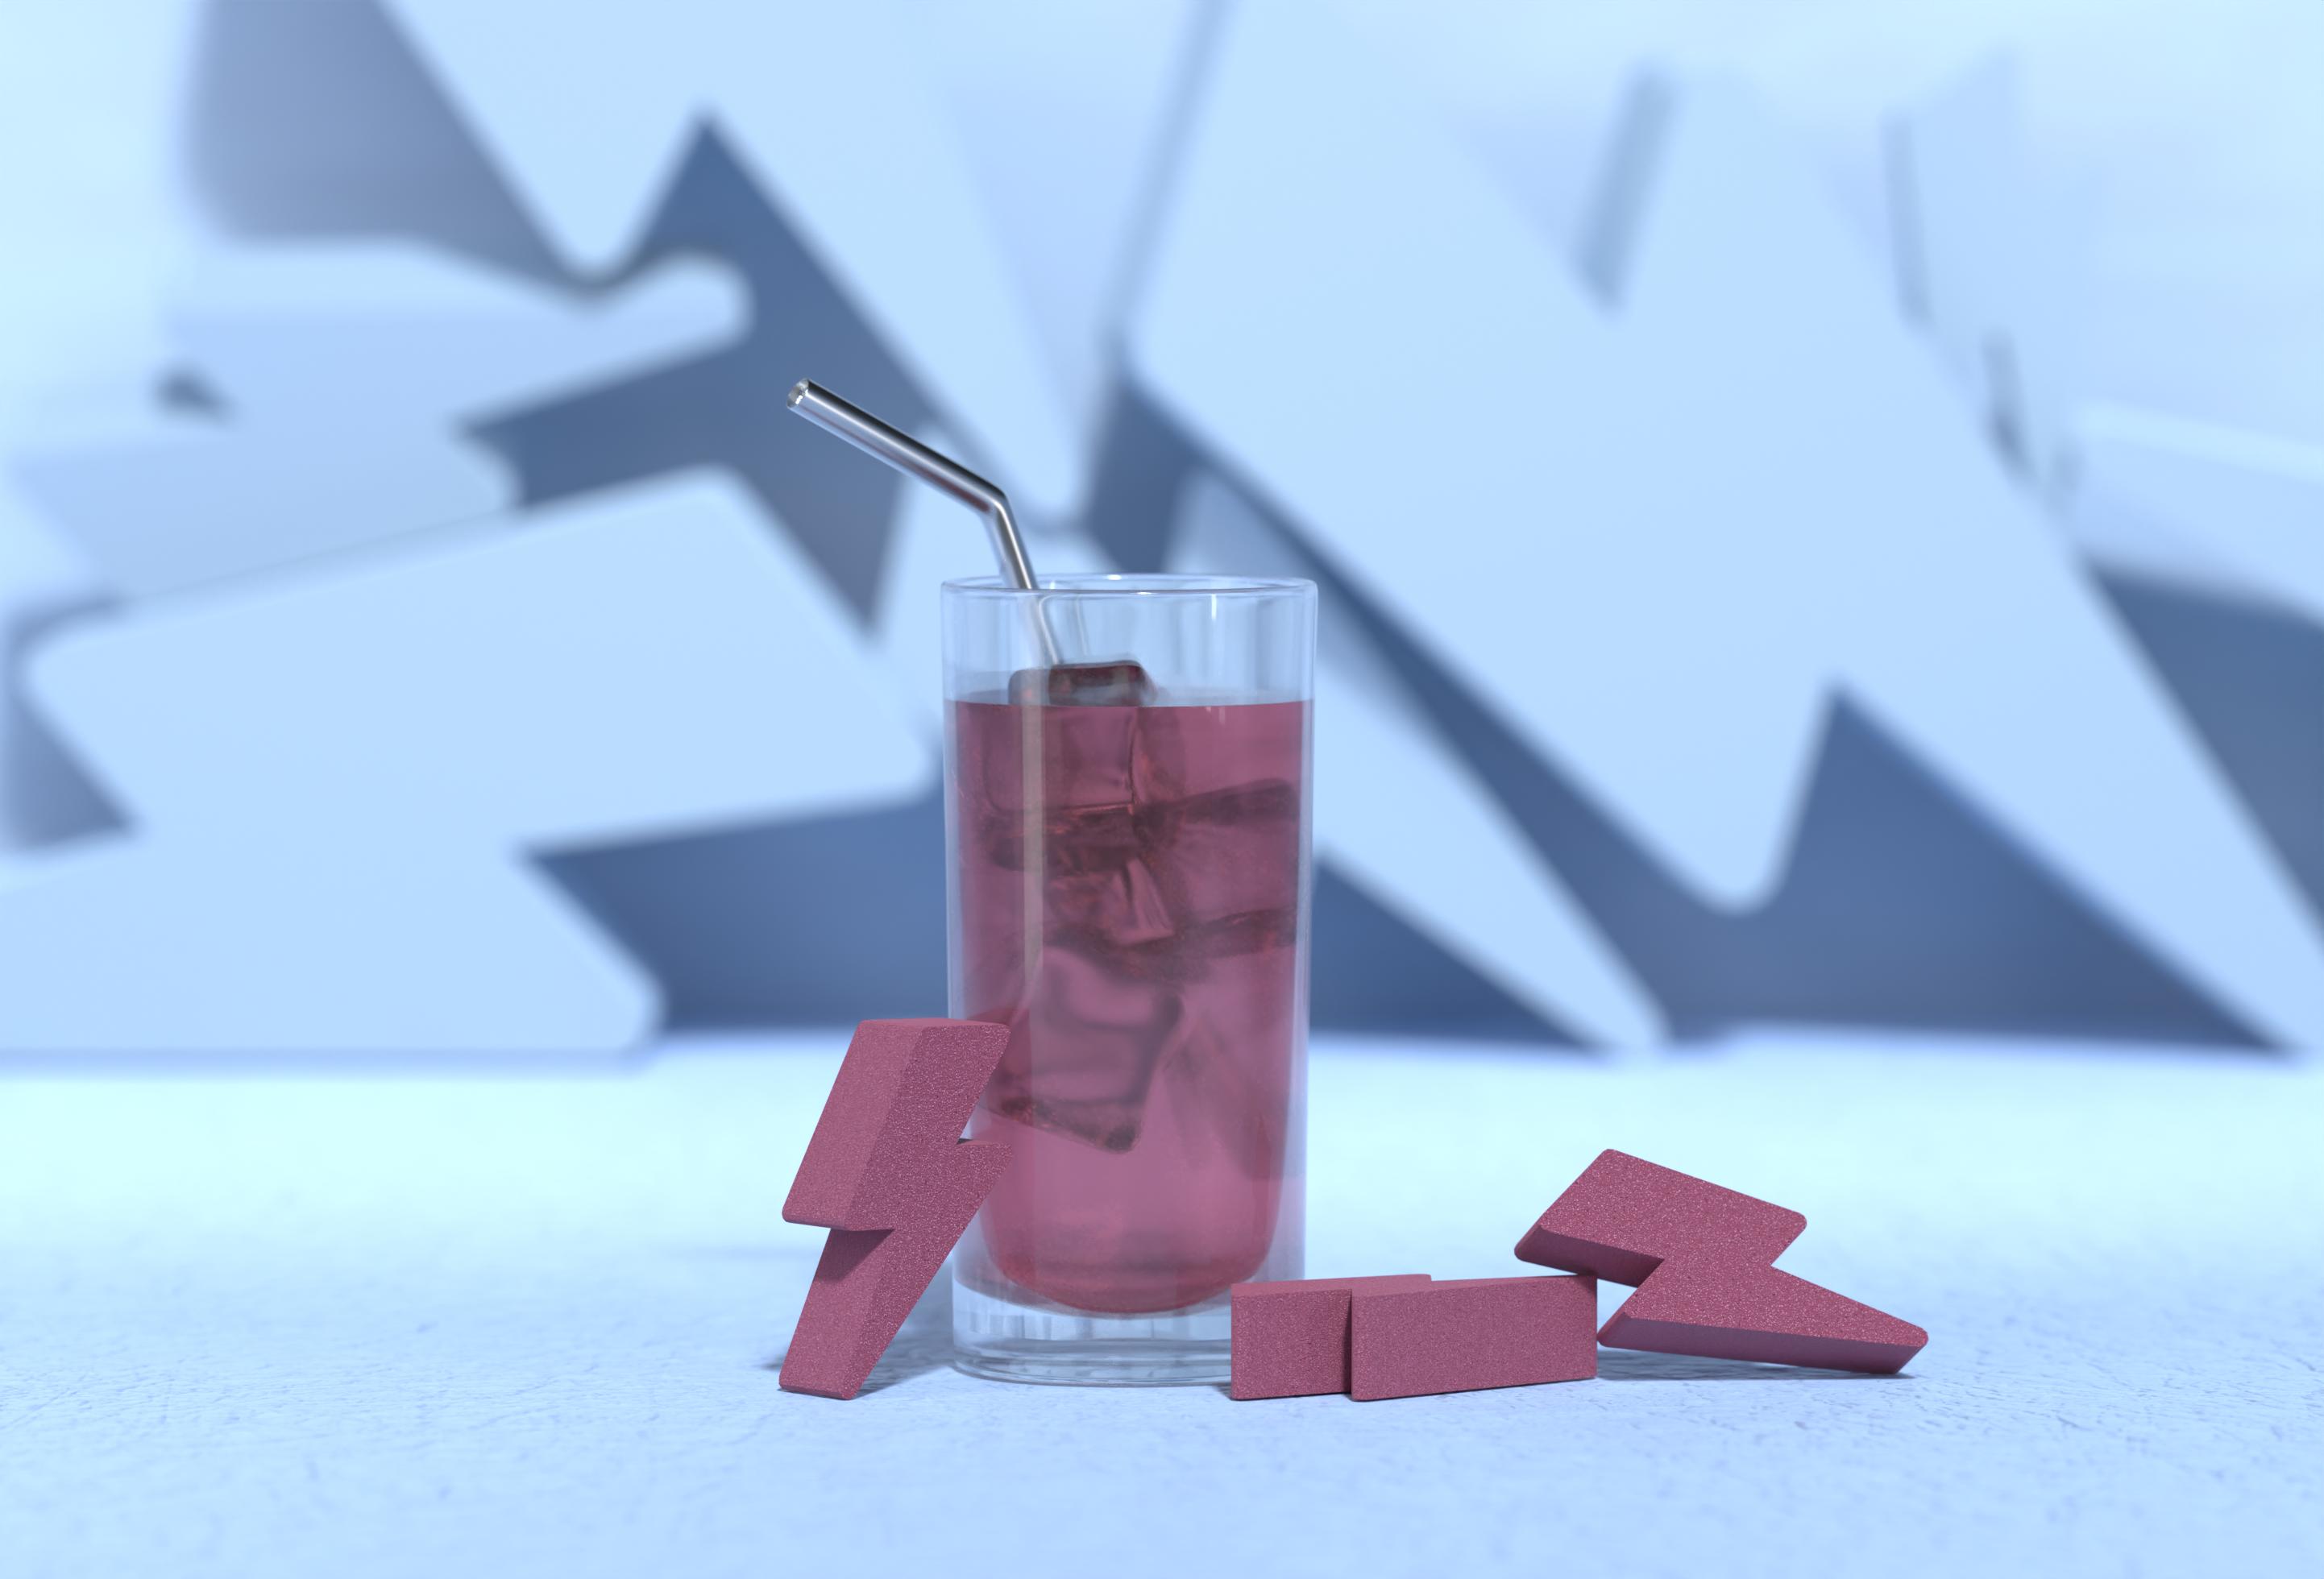 poseidn-3ddrink-3dfood-glassshot-ener-1